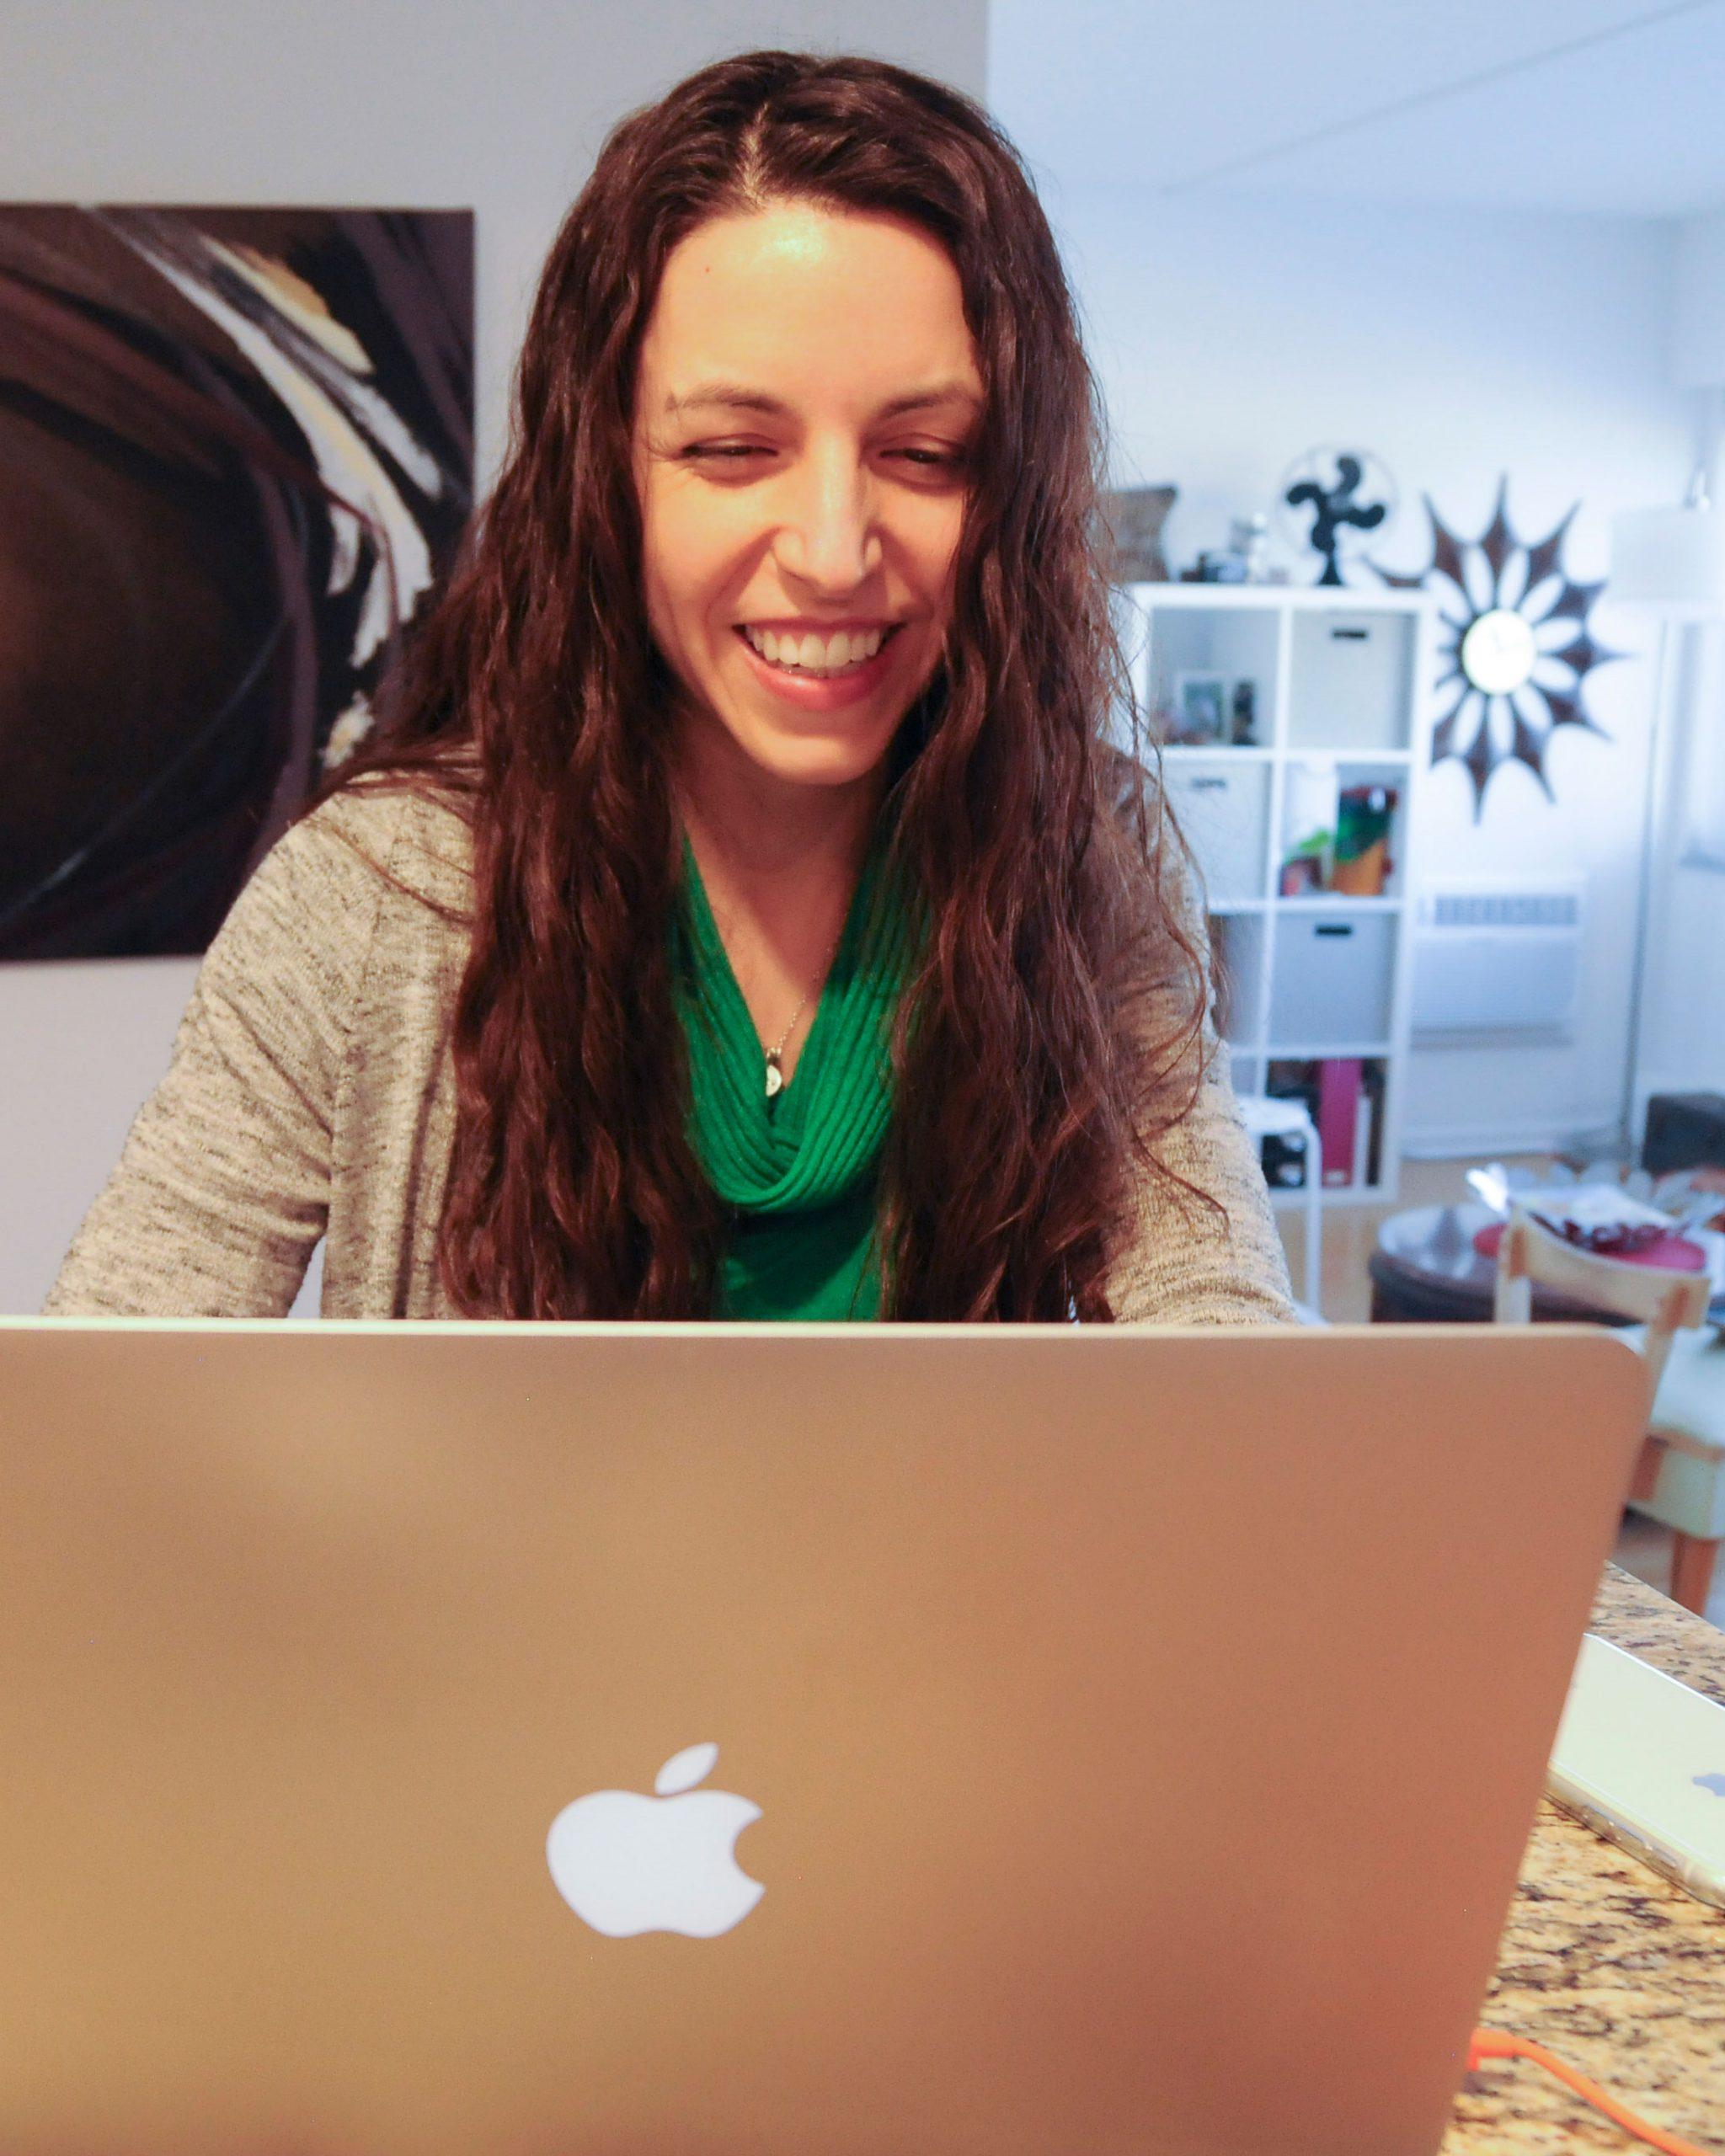 Lori smiling while working